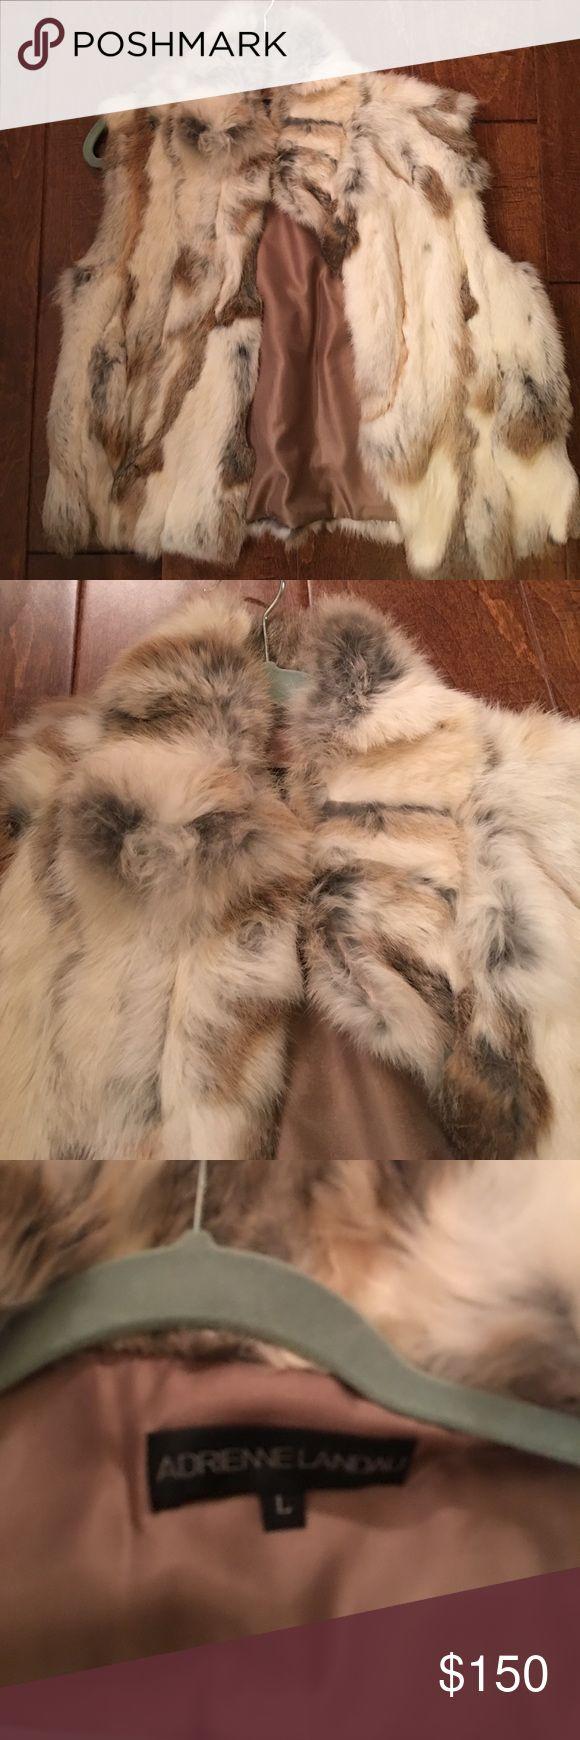 Adrienne Landau REAL fur vest - rabbit Adrienne Landau REAL fur vest - rabbit. Bought at Saks Off 5th. Great condition. Adrienne Landau Jackets & Coats Vests